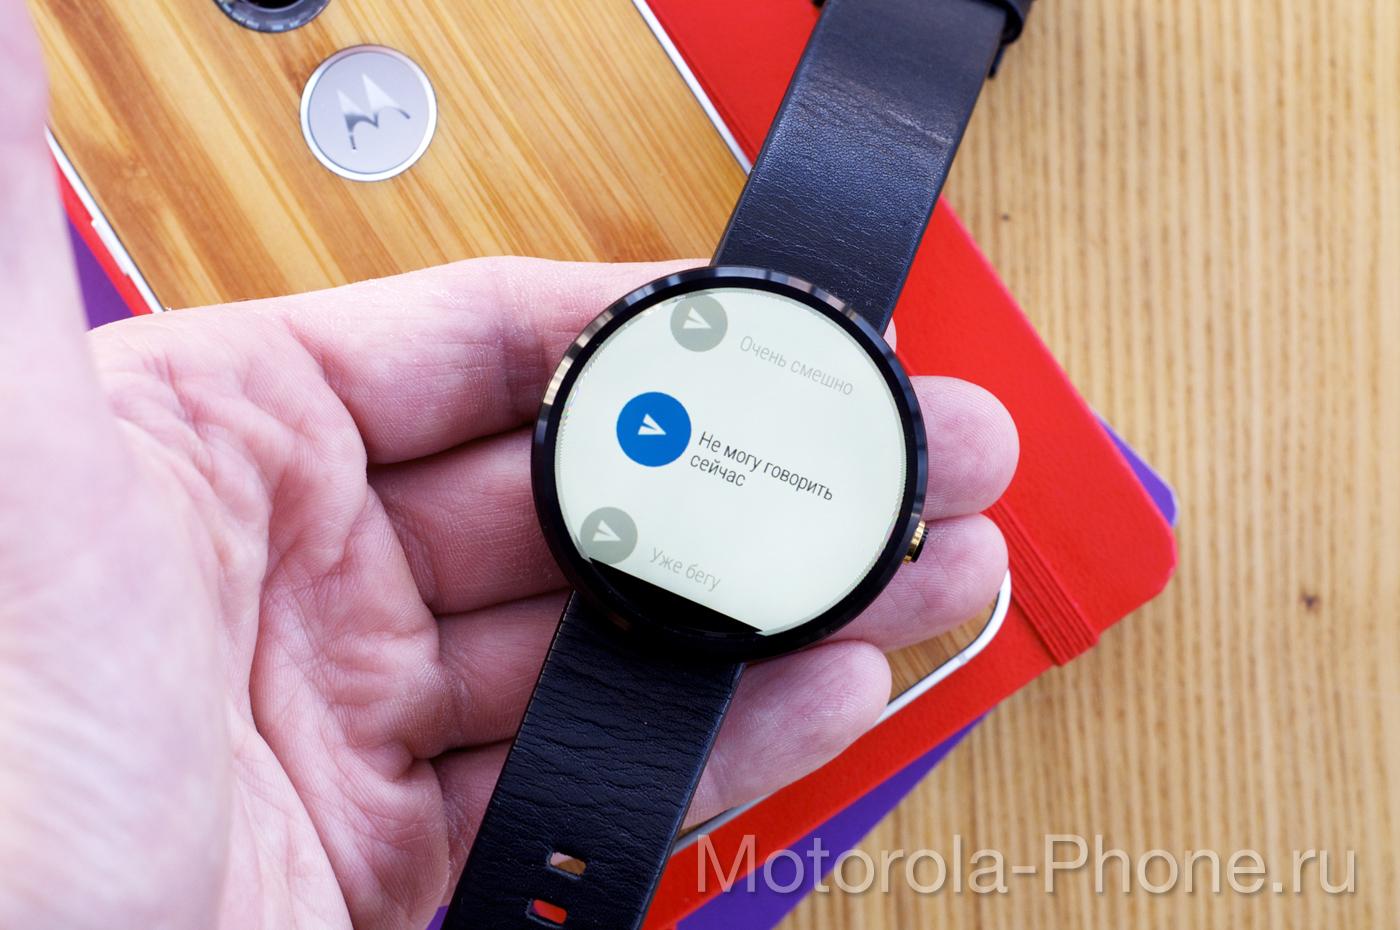 BBM-Android-Wear-Moto-07